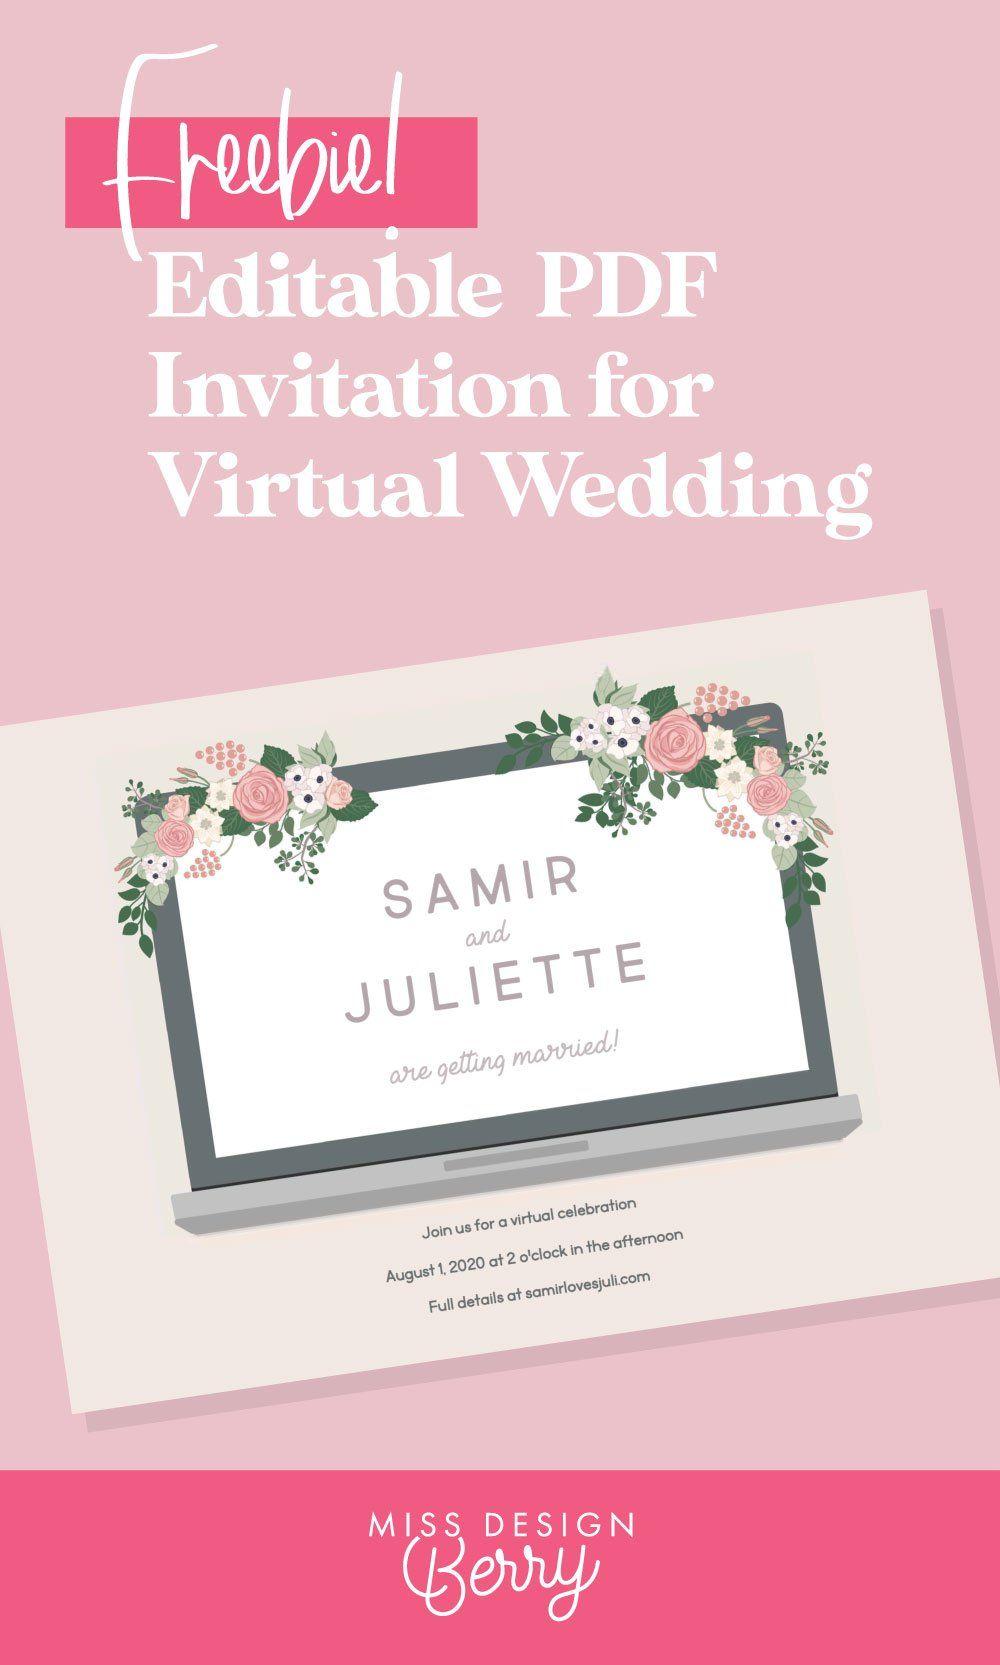 Free Printable Virtual Wedding Invitation Wedding Invitations Invitations Wedding Stationery Paper